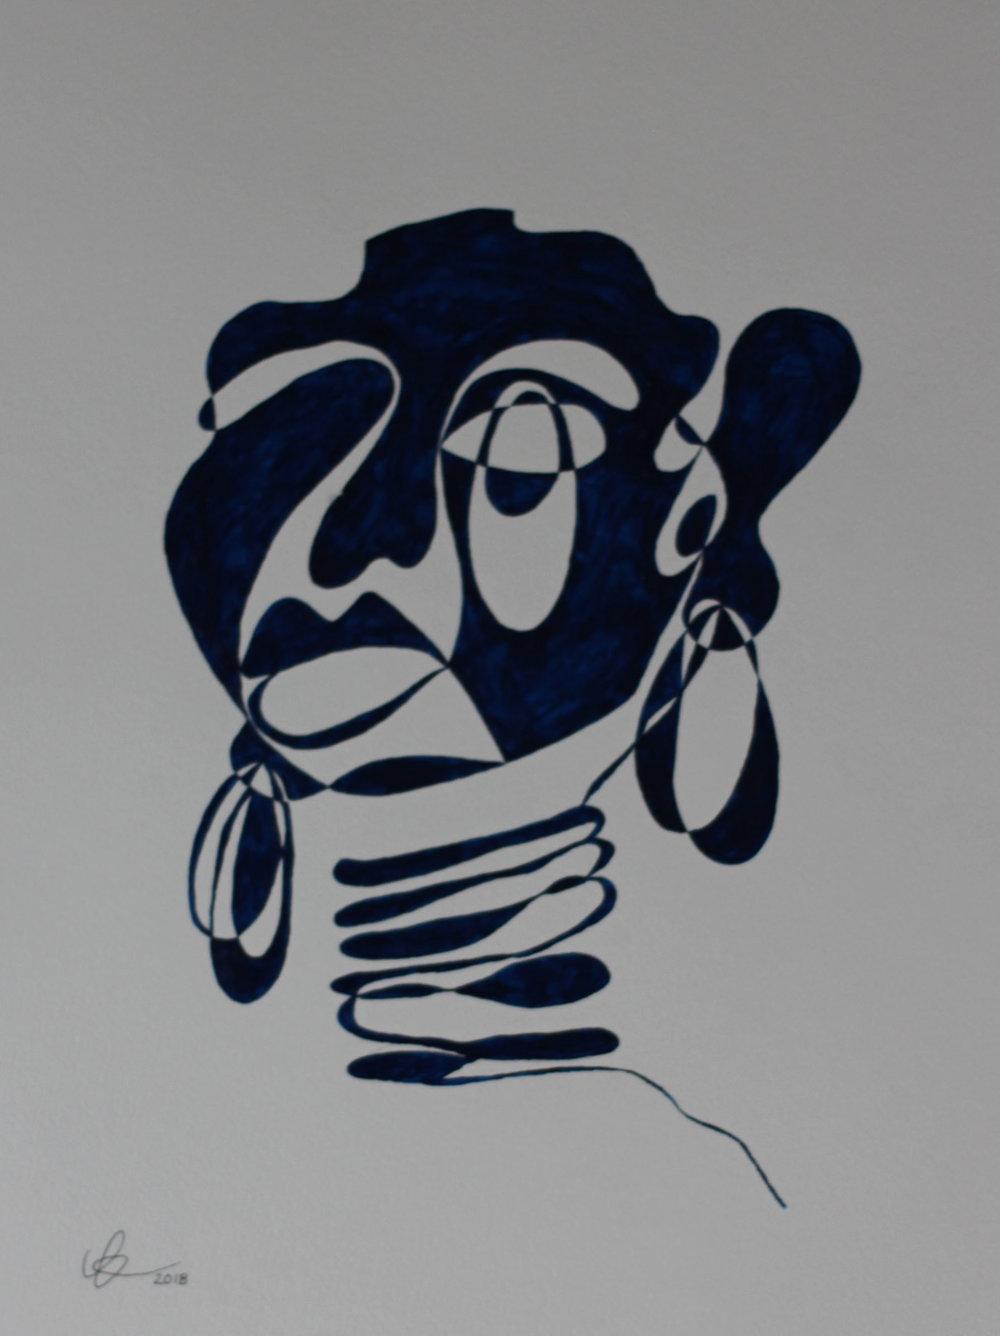 SOLDWomen 2018 - 42 cm x 56 cmAcrylic on LANA